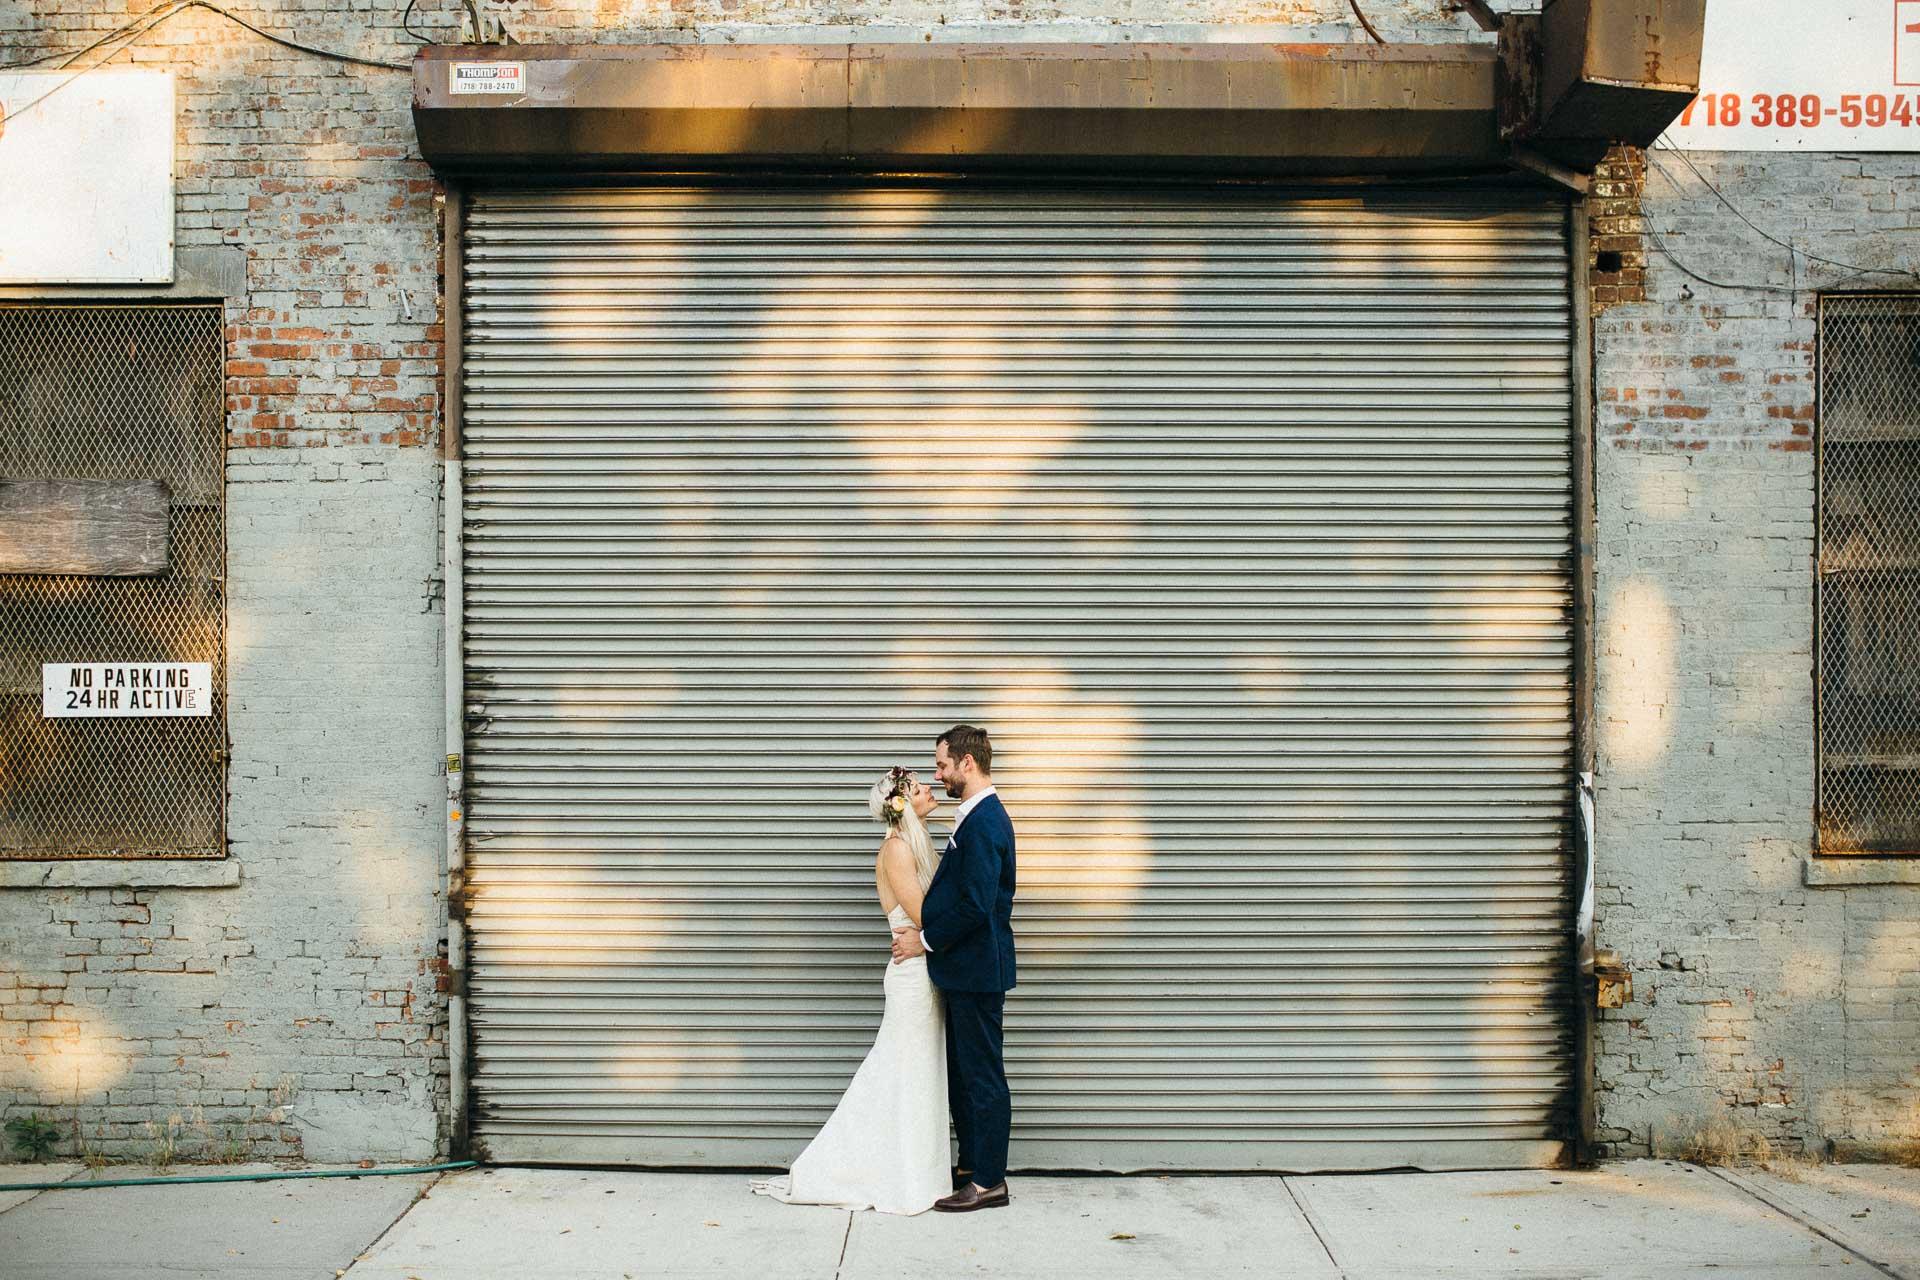 Maris & Brock's Wedding at The Glasserie, Greenpoint,Brooklyn, New York, USA